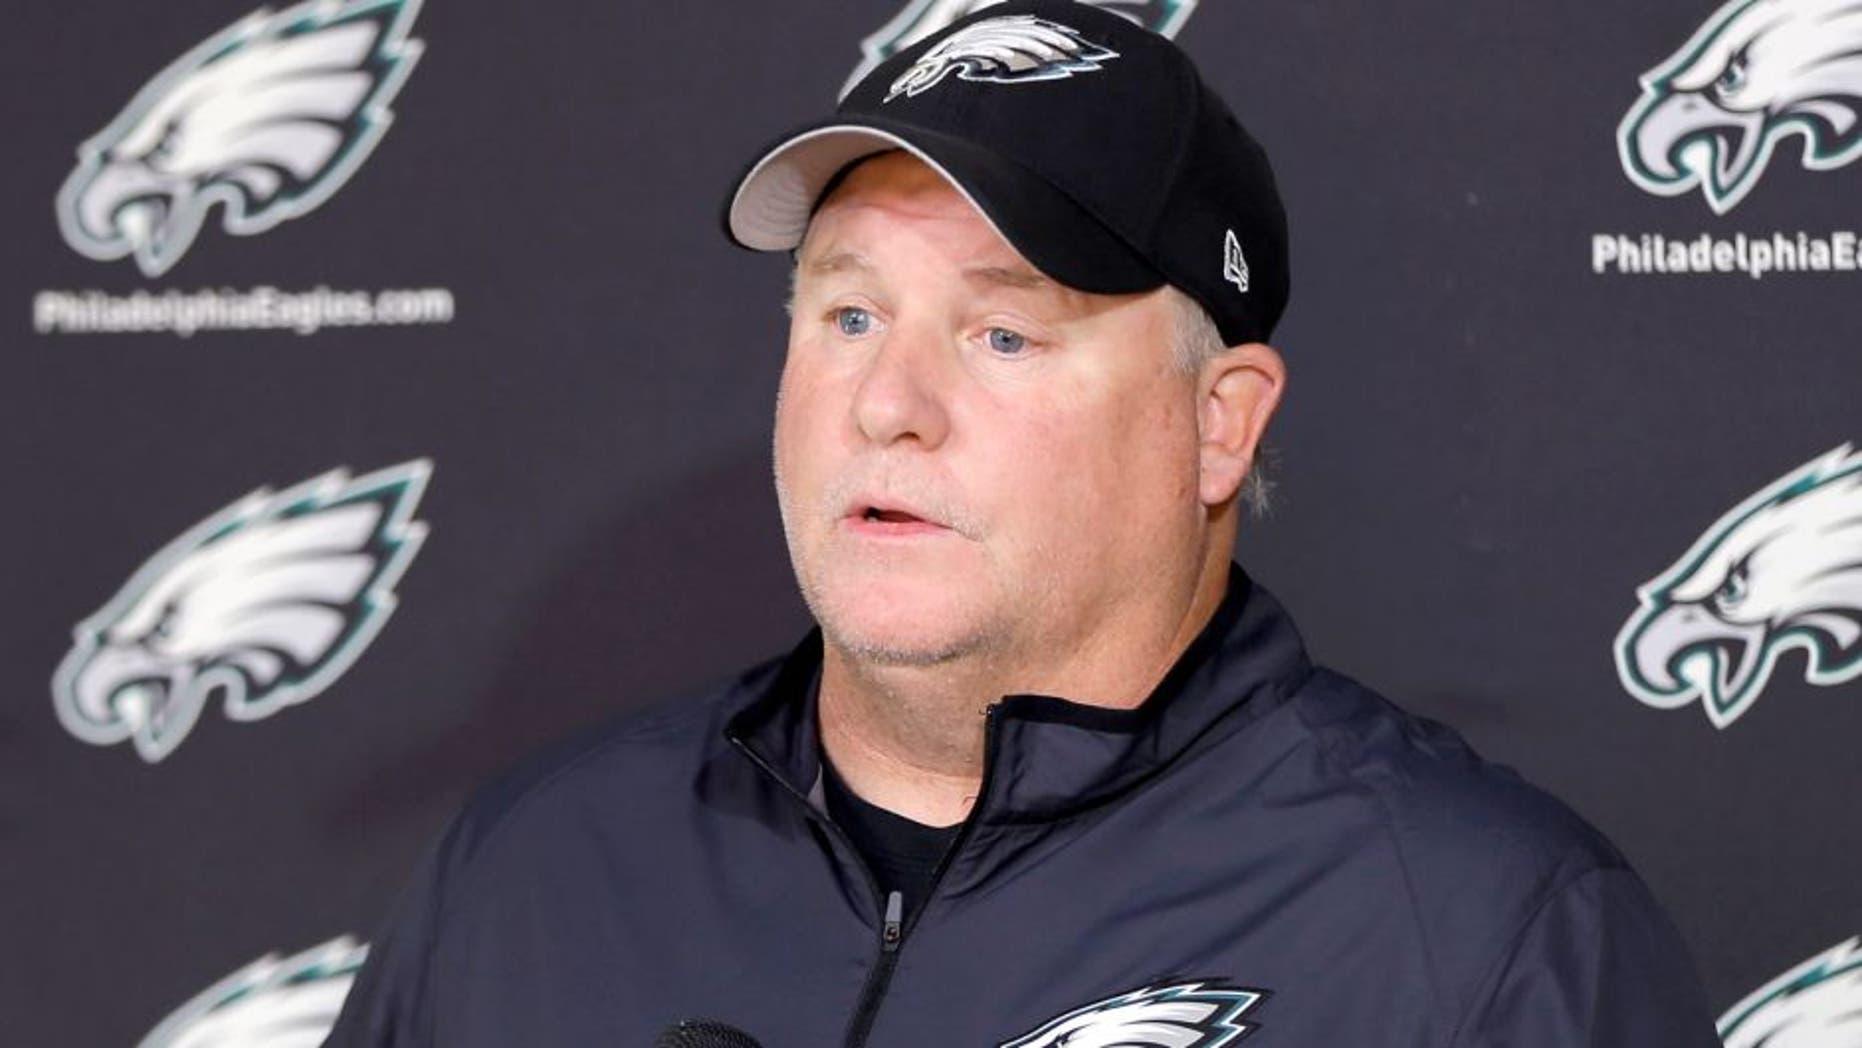 Philadelphia Eagles head coach Chip Kelly speaks with members of the media at the NFL football team's practice facility, Thursday, Oct. 15, 2015, in Philadelphia. (AP Photo/Matt Rourke)